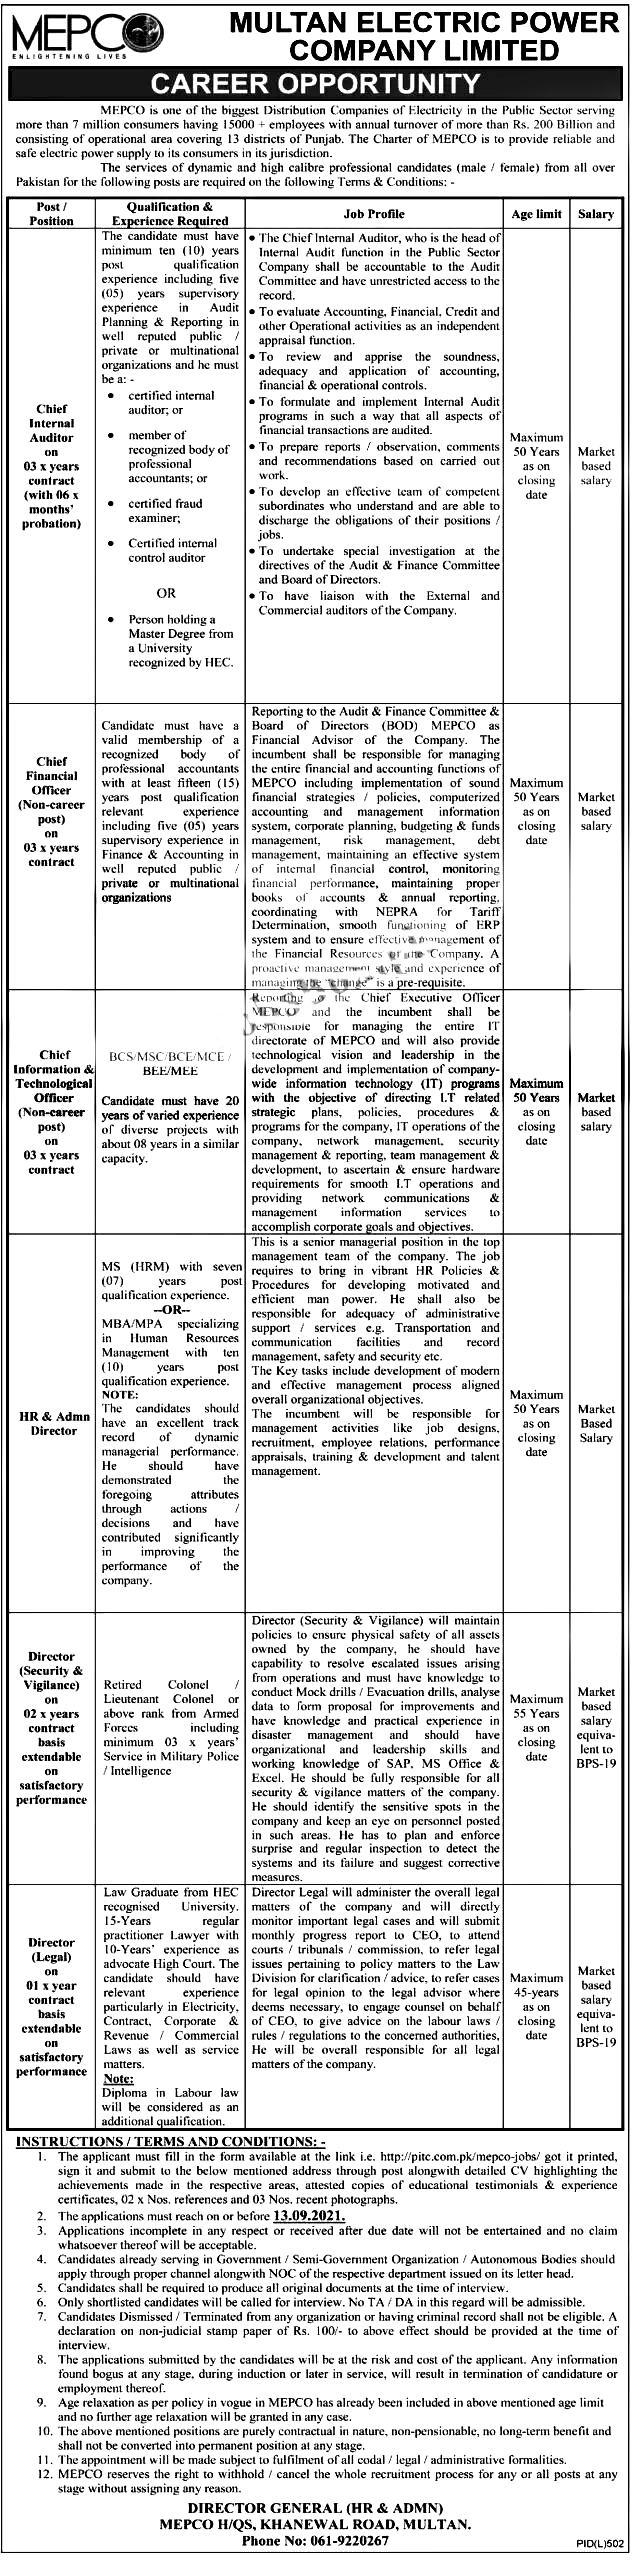 Multan Electric Power Company MEPCO Multan Jobs 2021